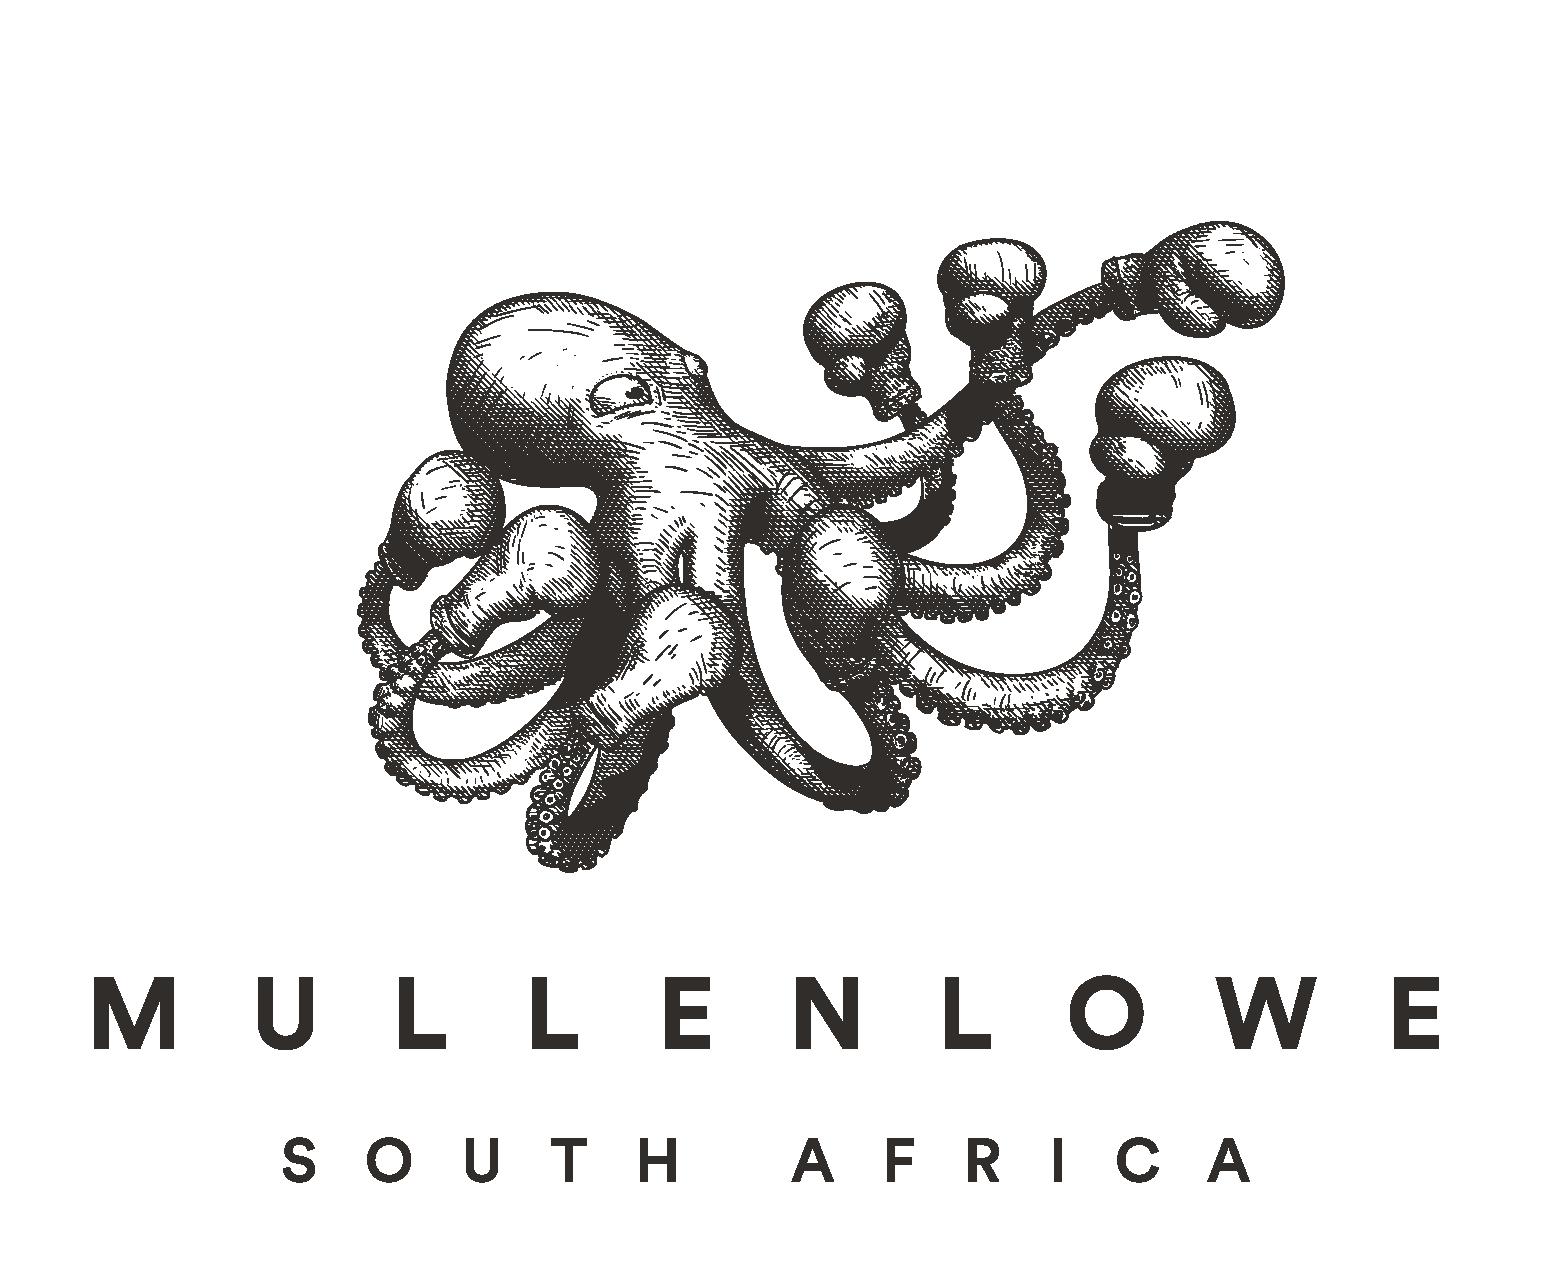 MullenLowe South Africa